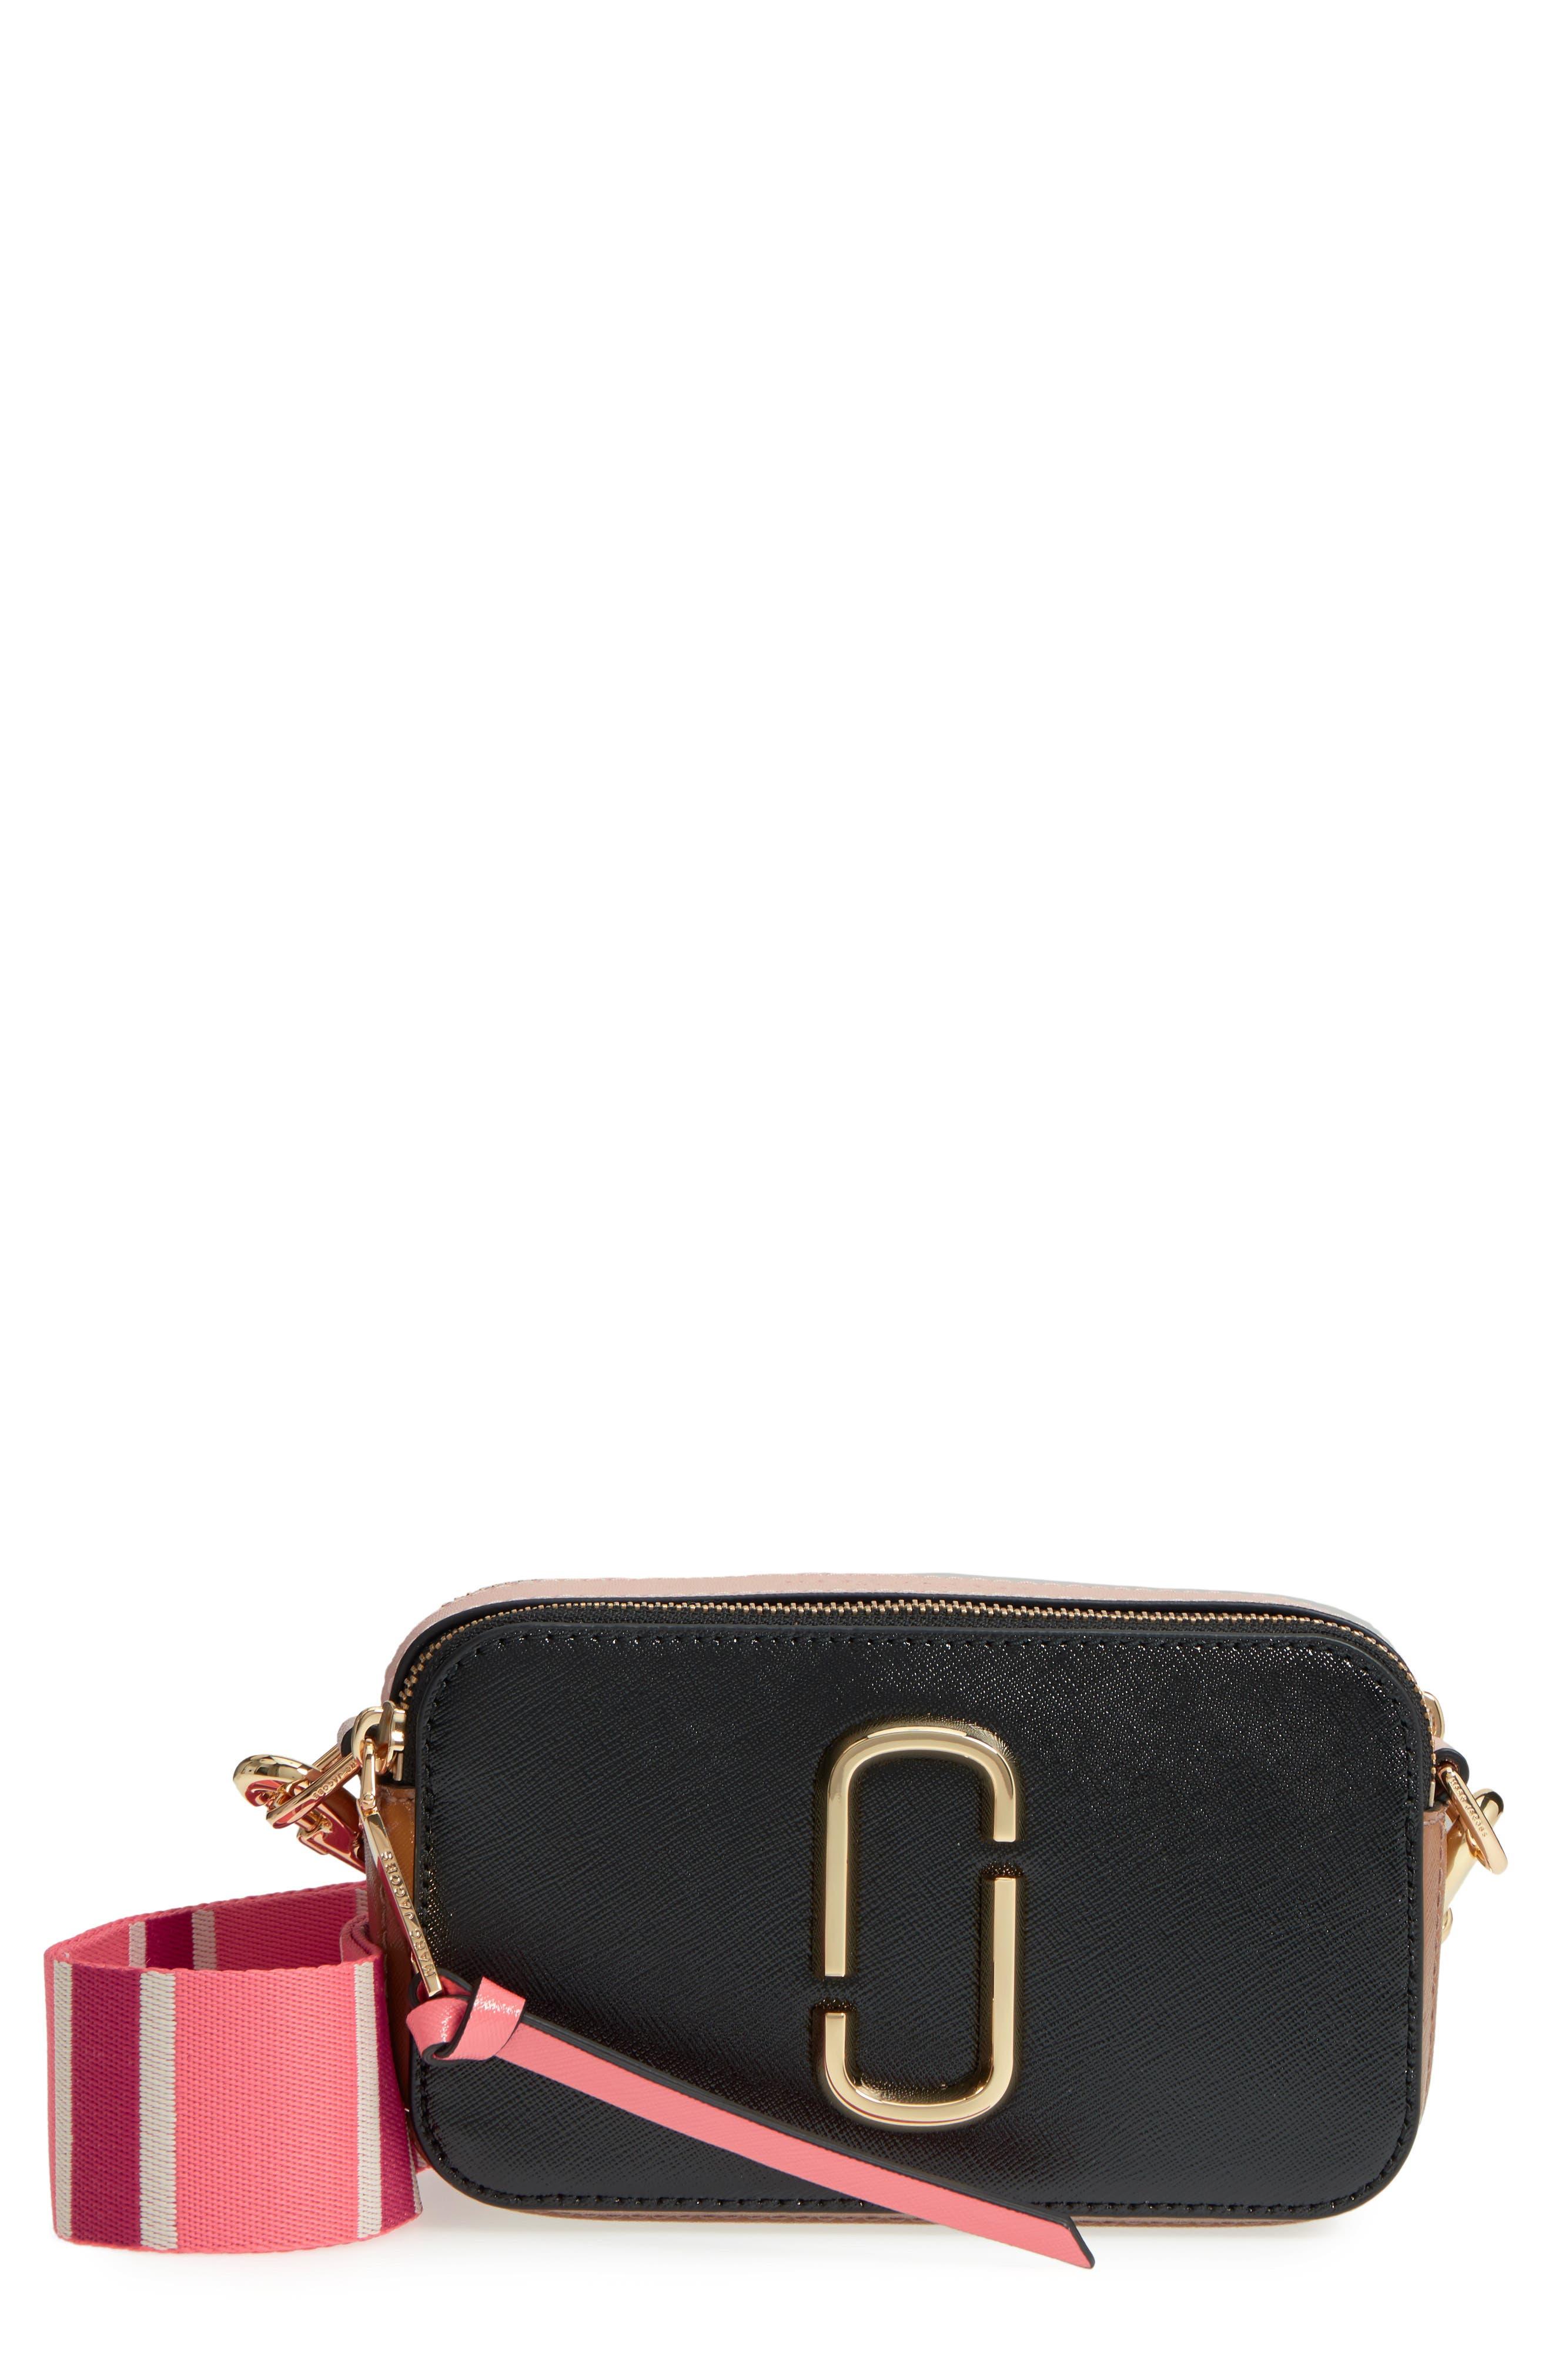 Alternate Image 1 Selected - MARC JACOBS Snapshot Crossbody Bag